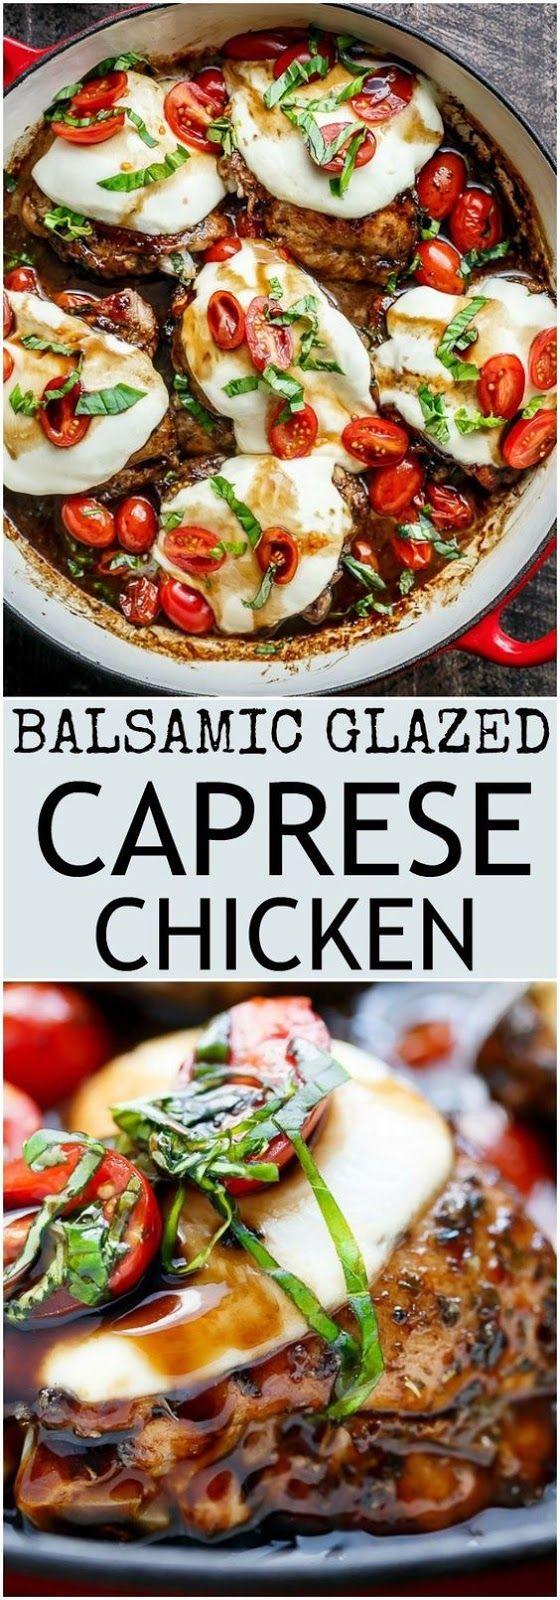 Balsamic Glazed Caprese Chicken Recipe | CUCINA DE YUNG